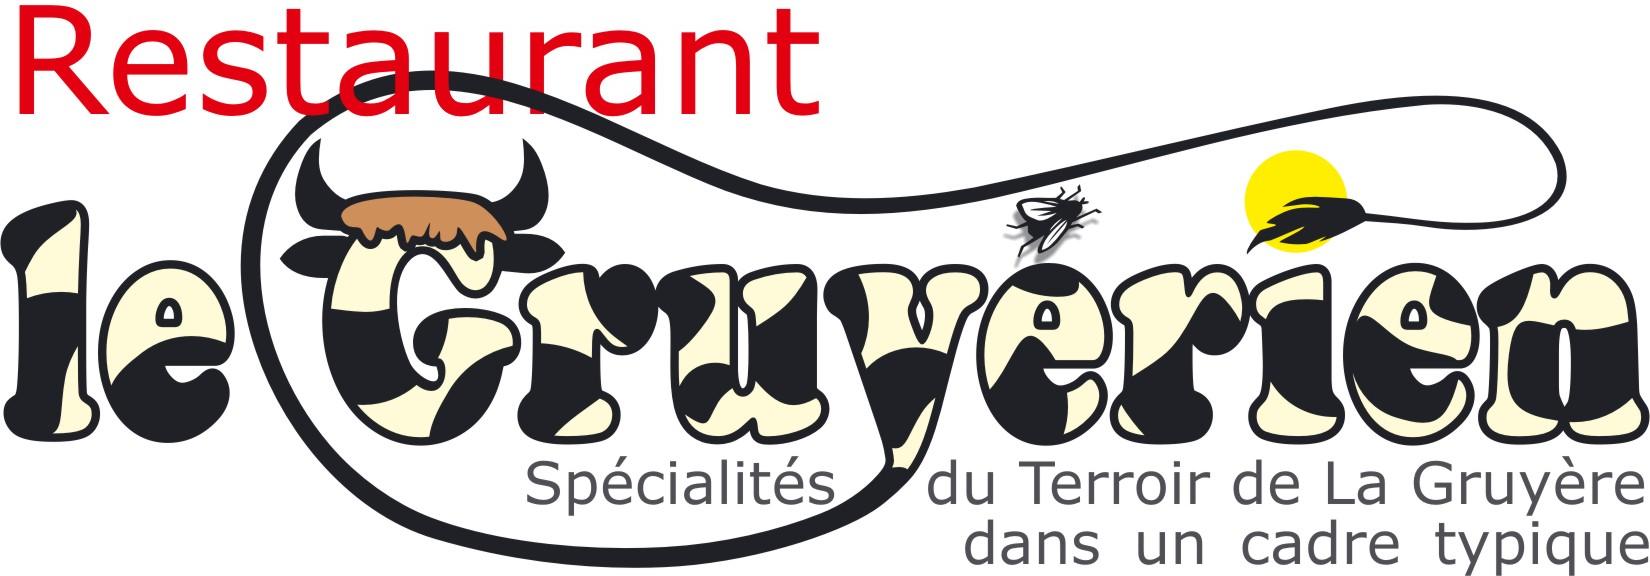 Le Gruyérien - Chêne-Bougeries